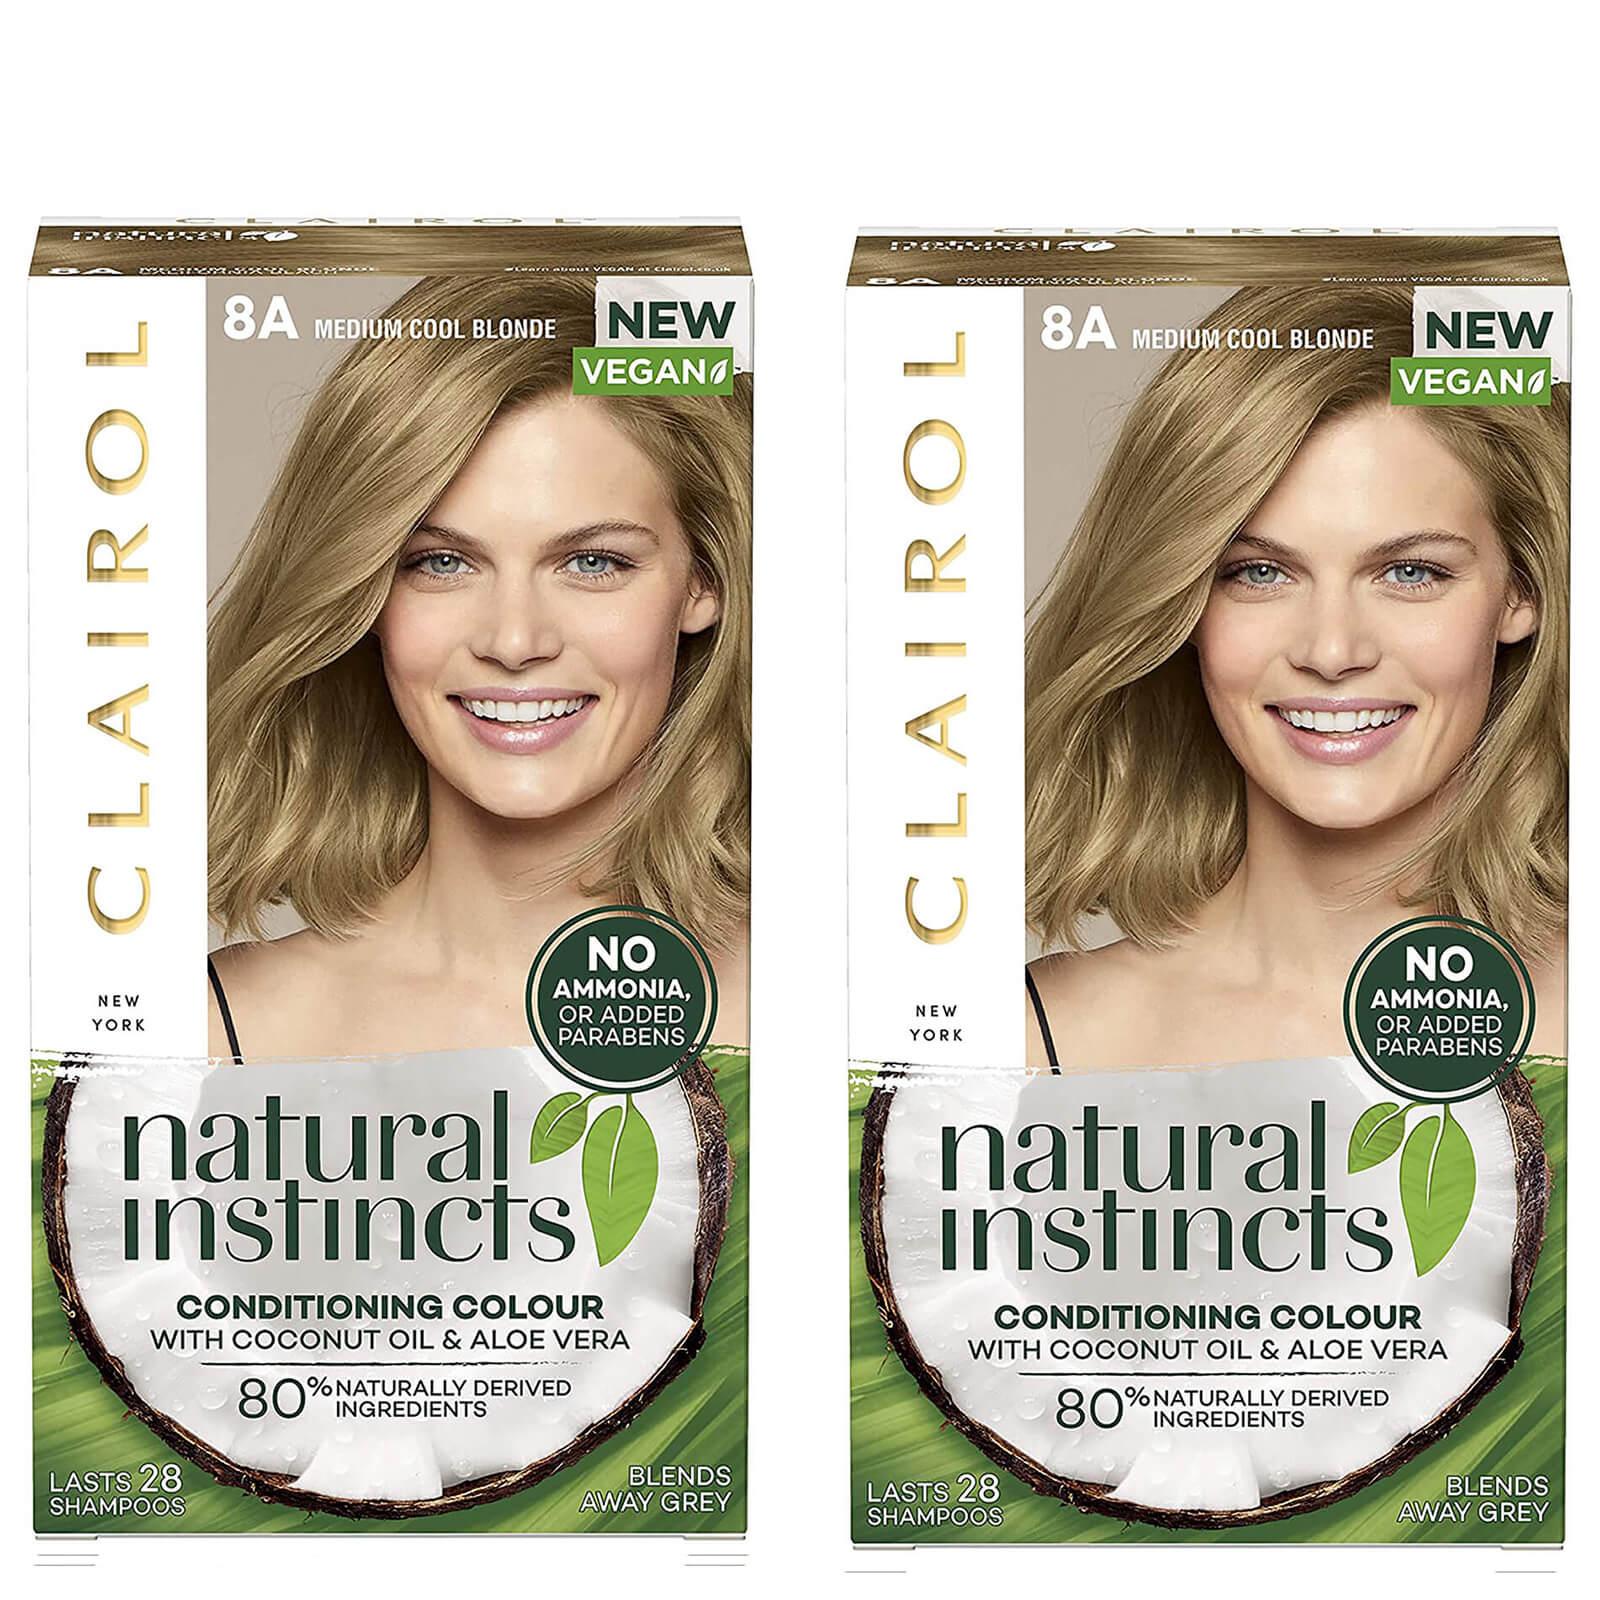 Clairol Natural Instincts Semi Permanent No Ammonia Vegan Hair Dye Duo Various Shades Lookfantastic Singapore